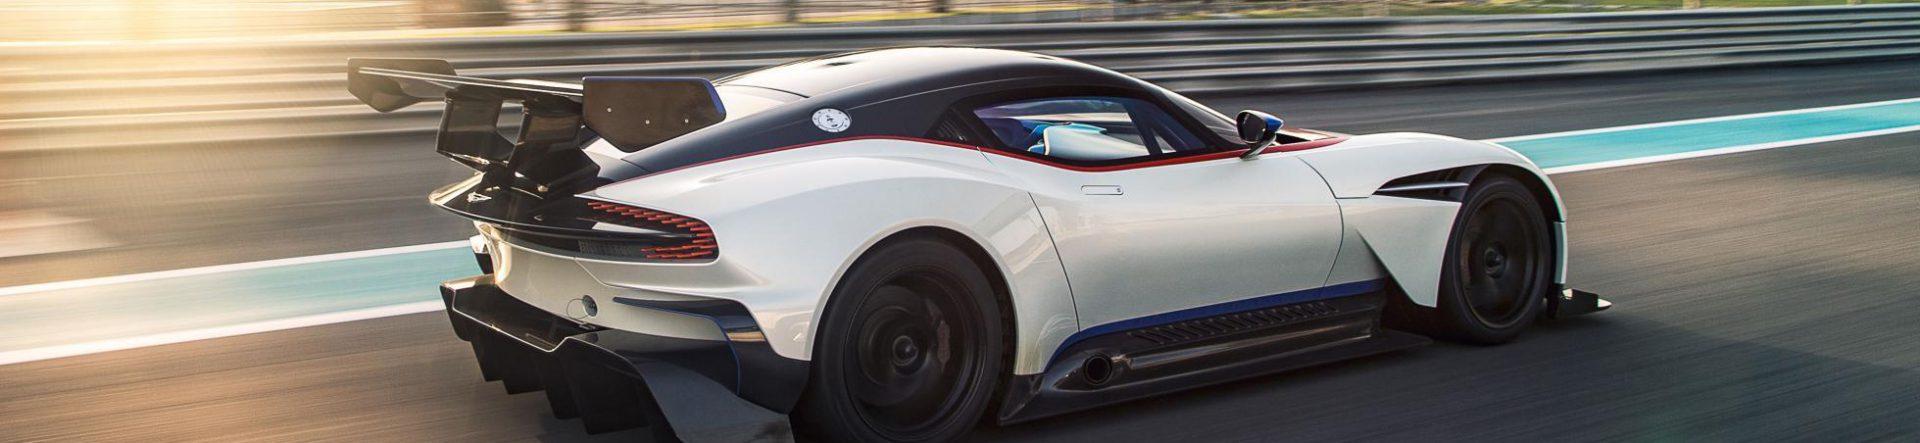 New Top Gear Trailer Features The Ferrari 250gt Tdf And Aston Martin Vulcan Team Vvv